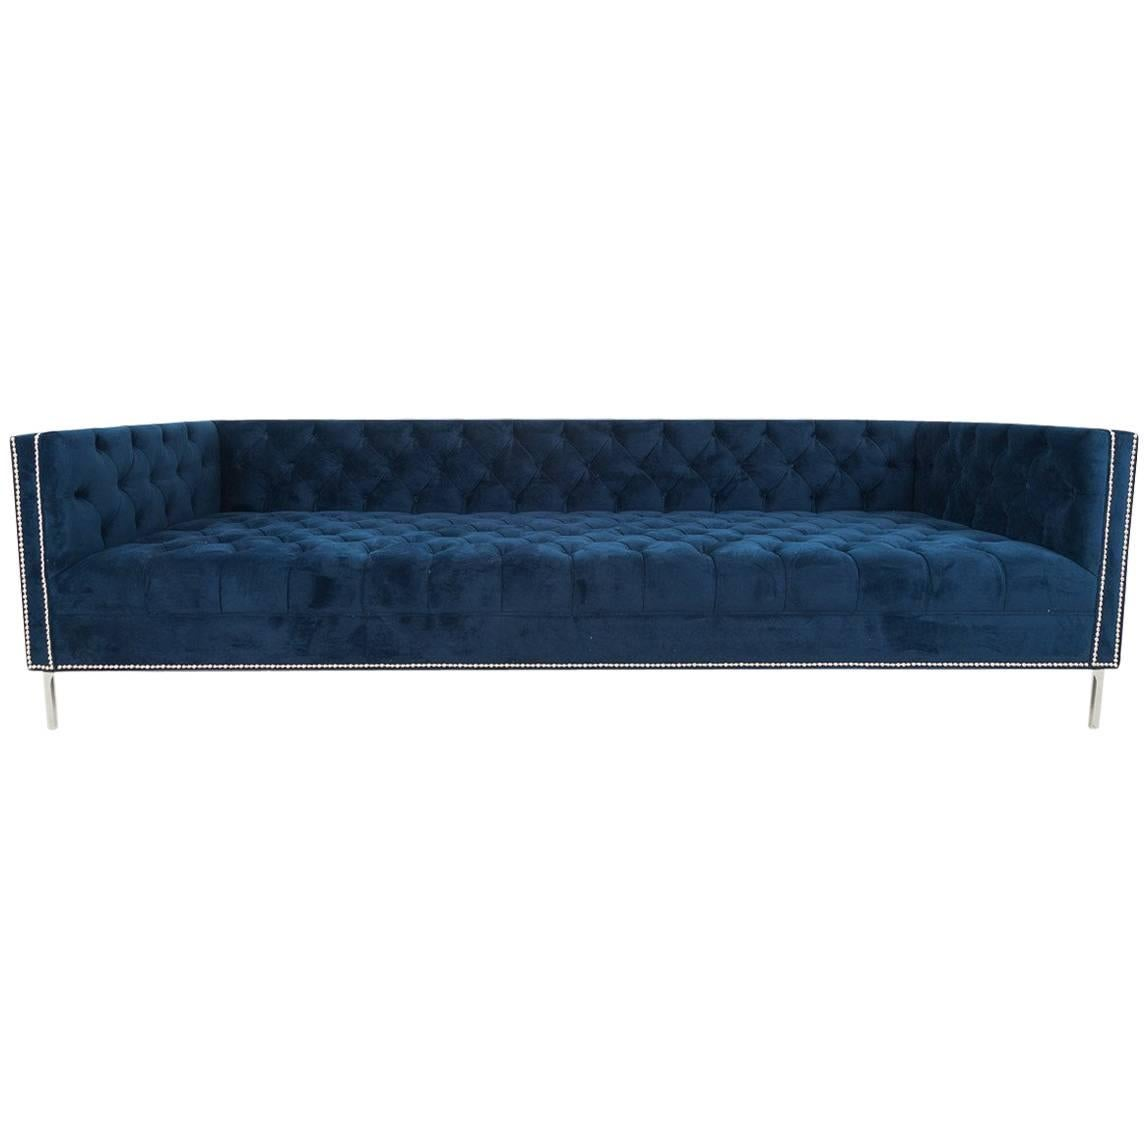 Extra Deep Mid-Century Style Sofa Hand Tufted in Navy Velvet w/ Chrome Legs